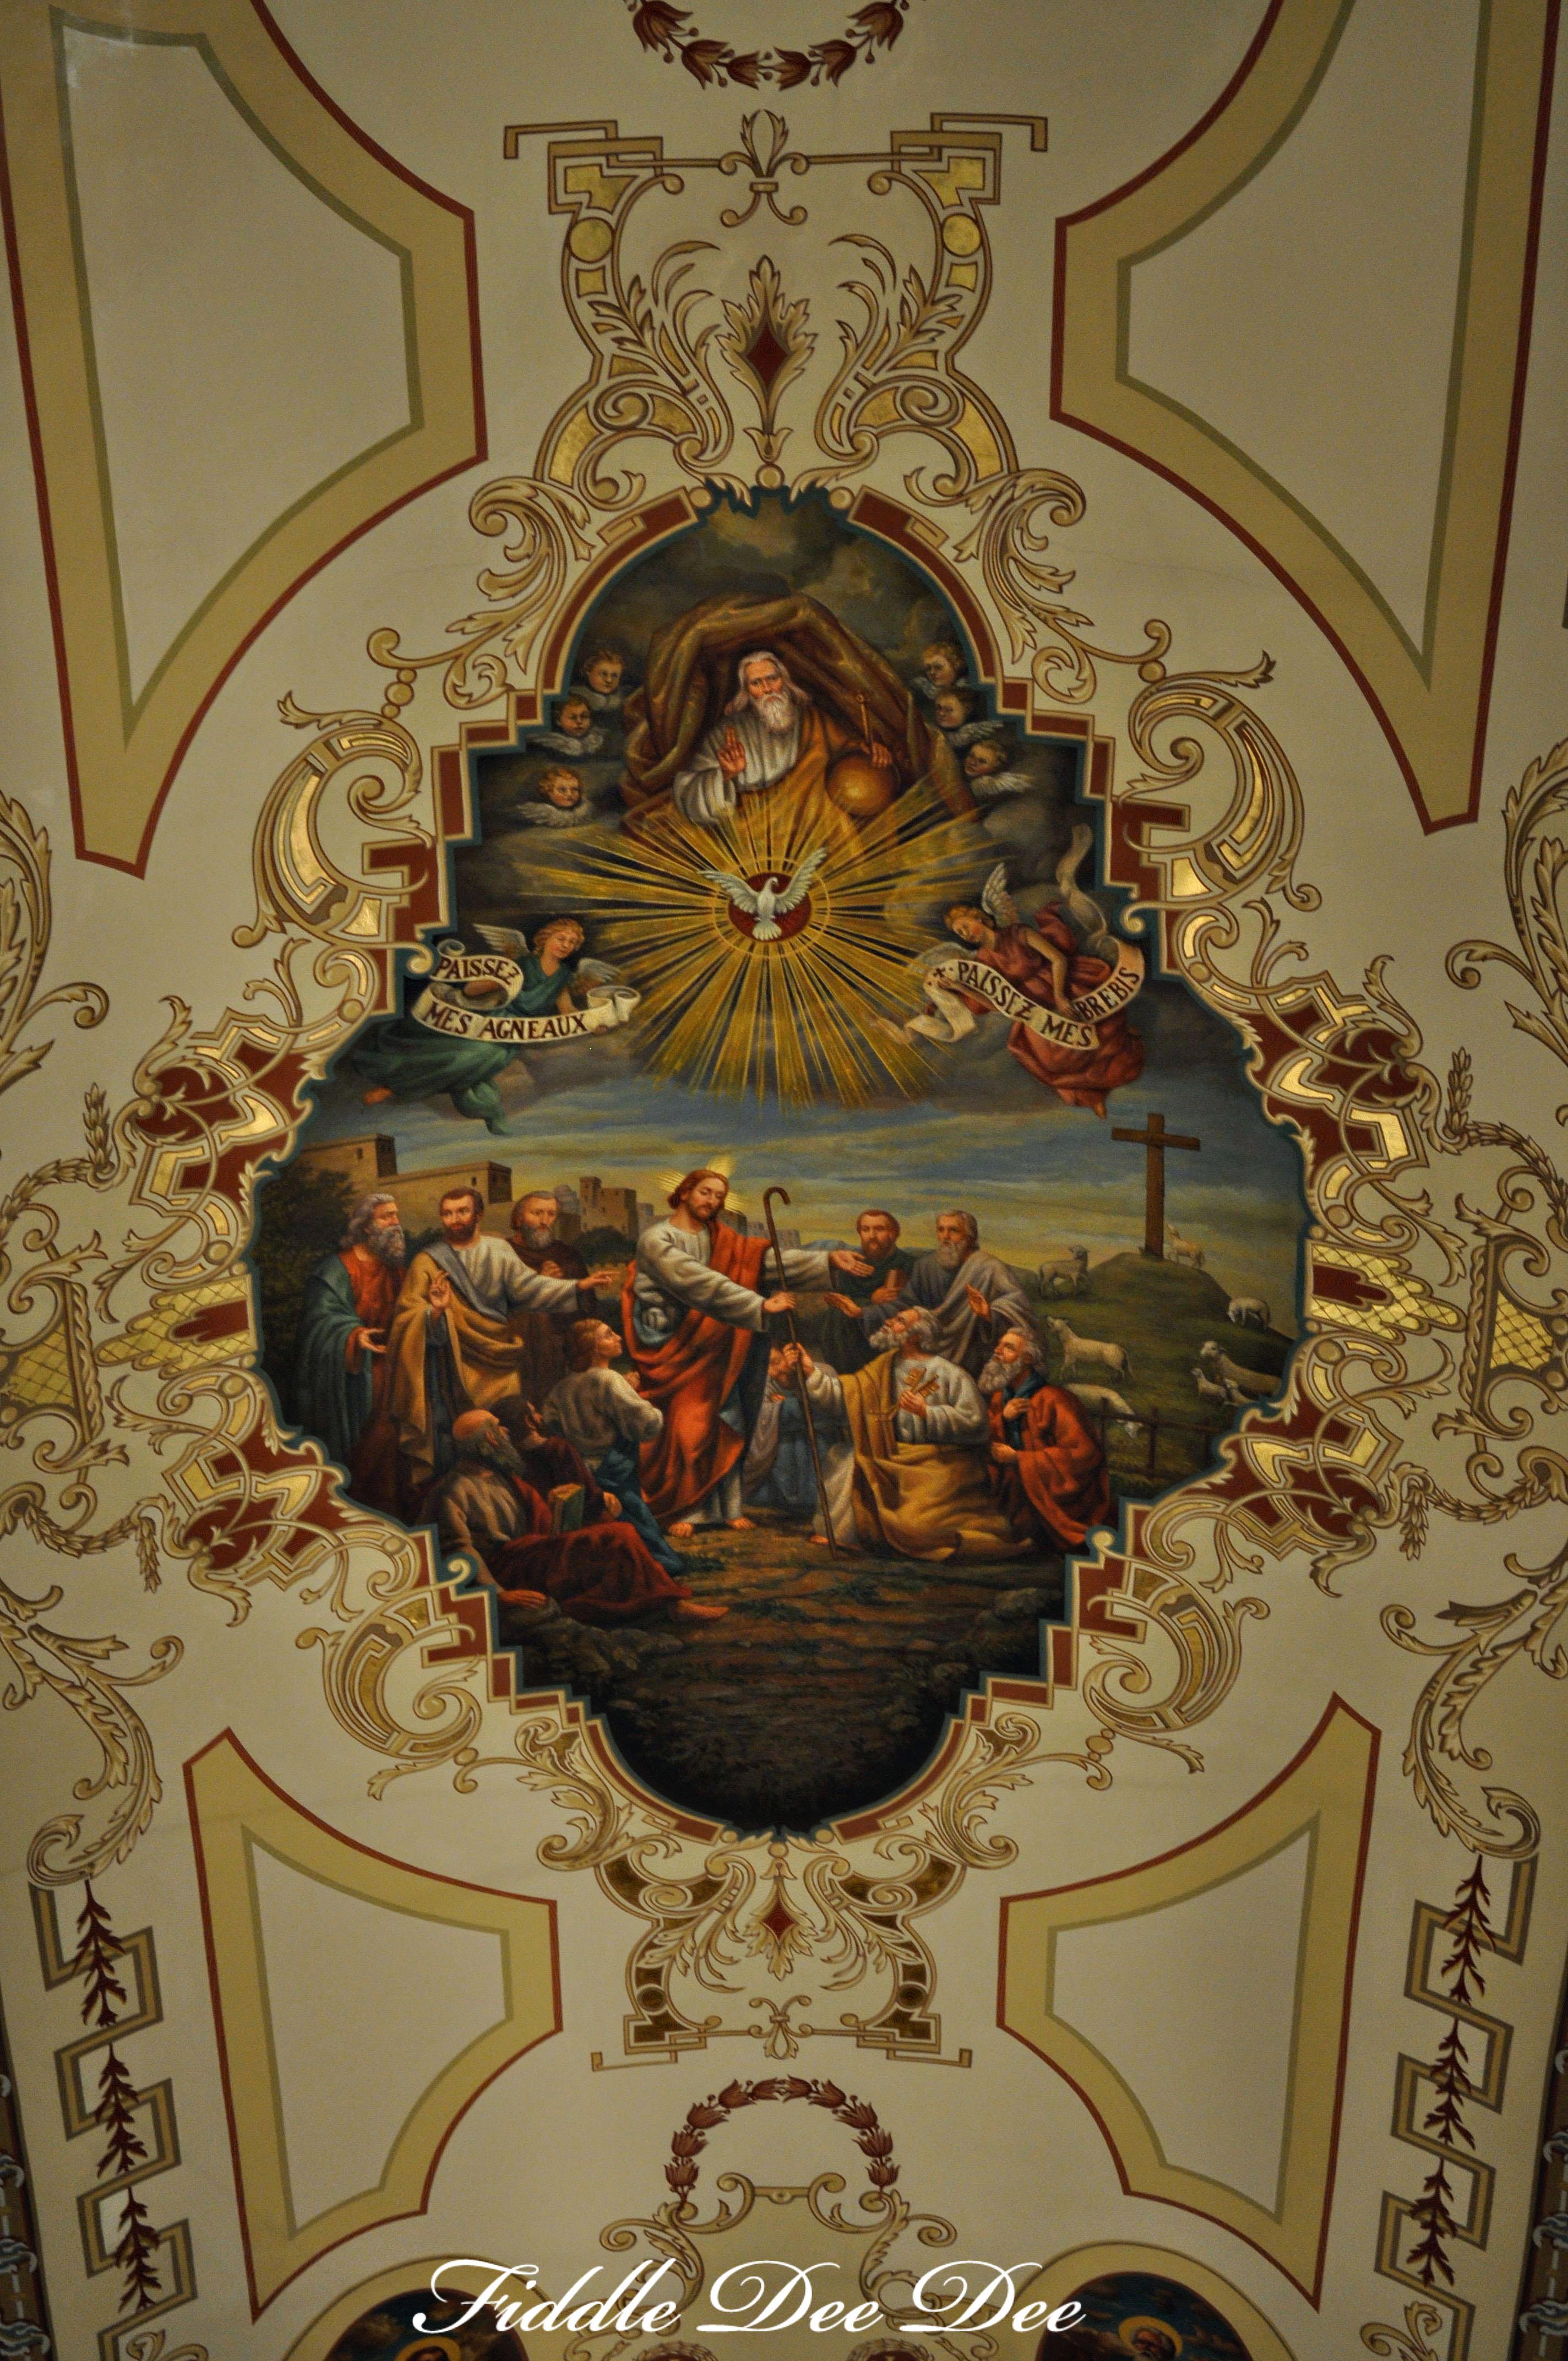 saint-louis-cathedral-3-ohfiddledeedee-com